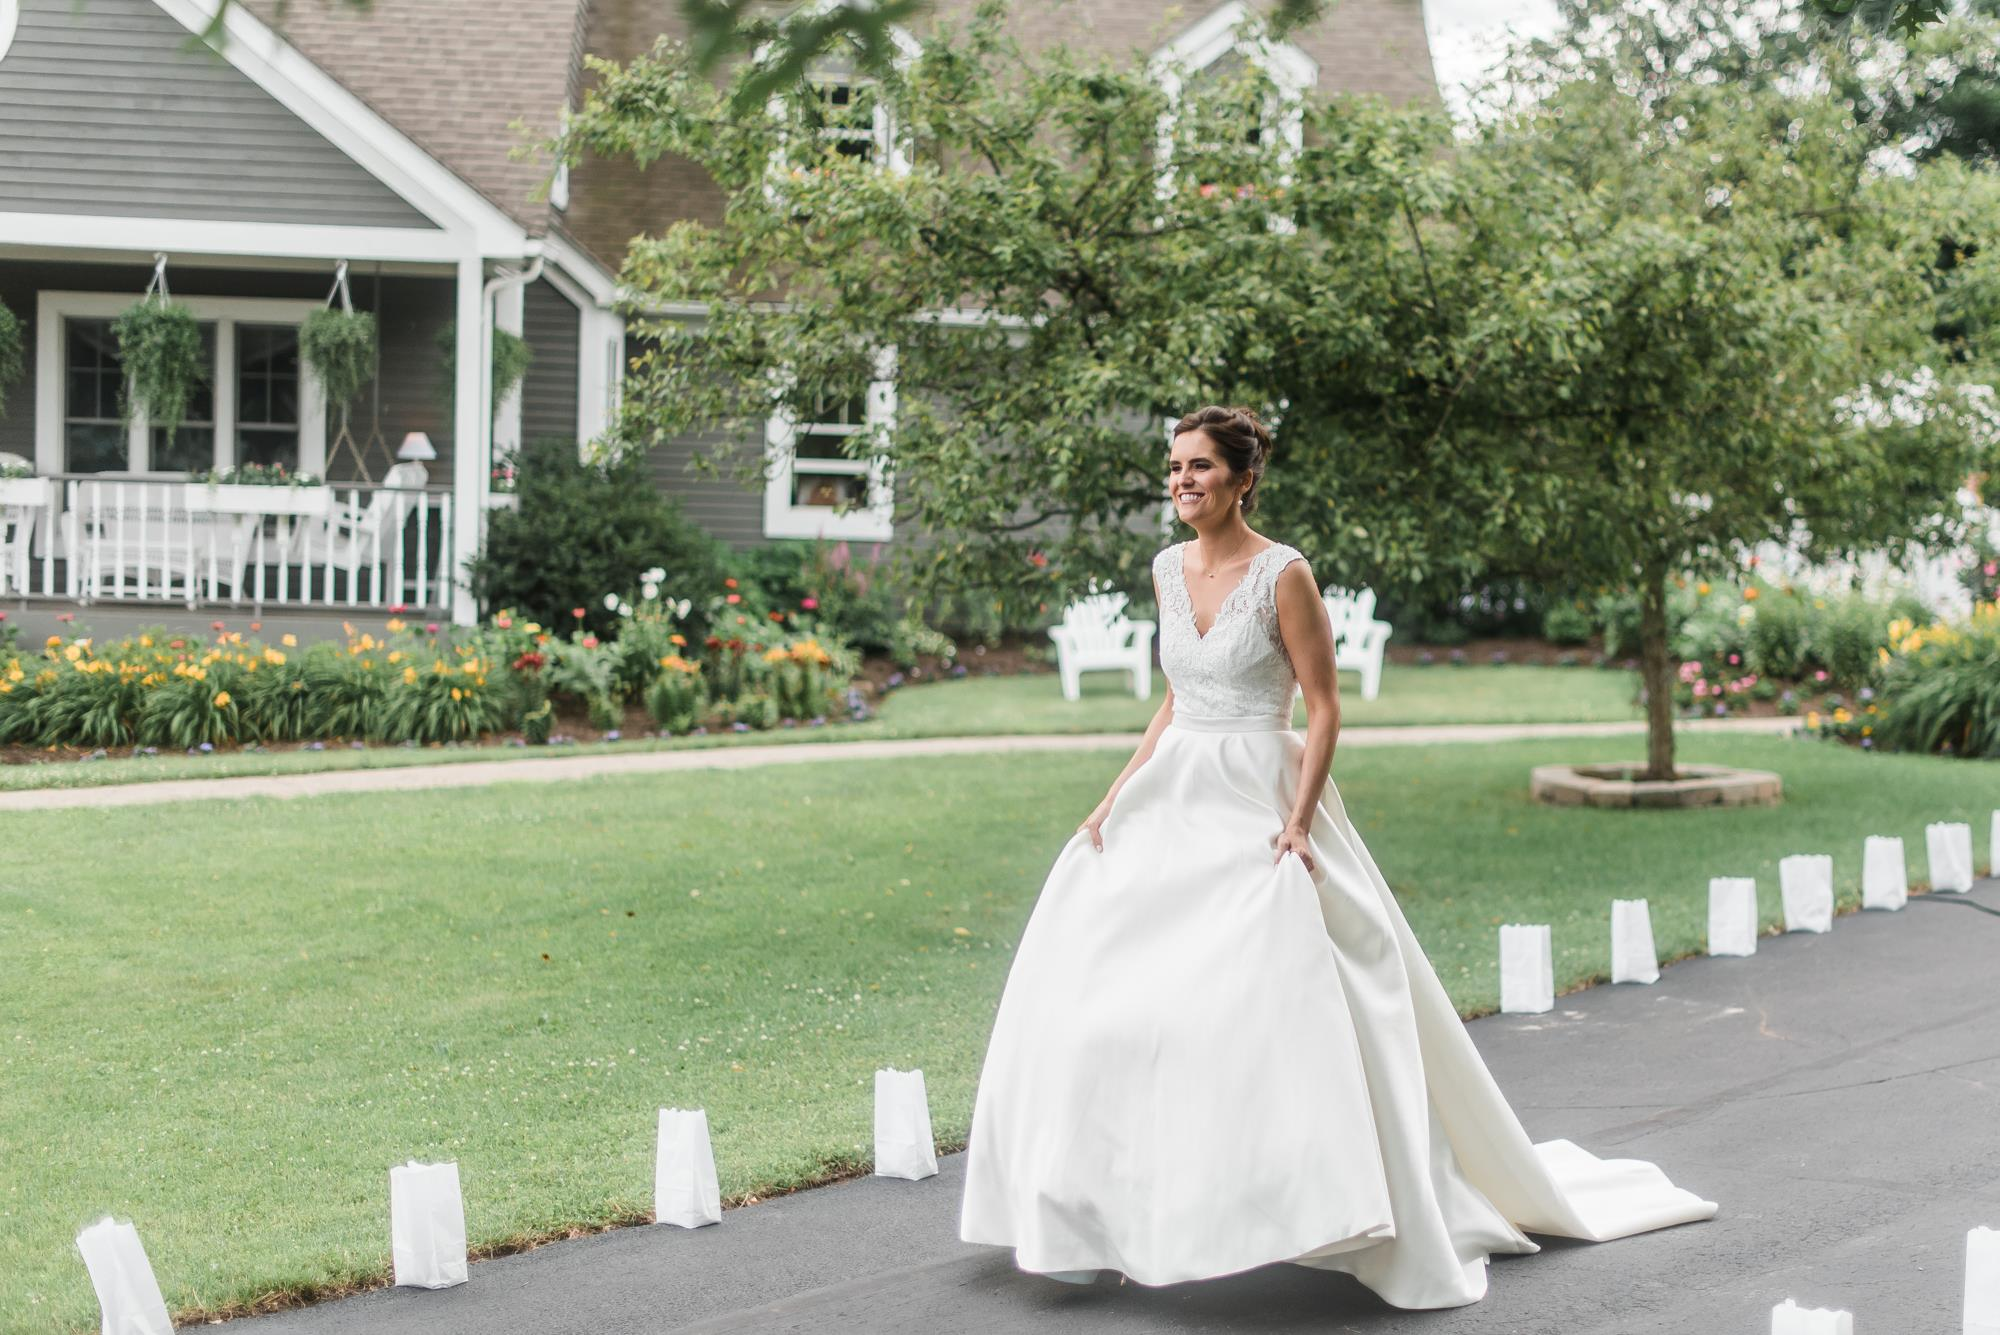 pittsburgh-pennsylvania-backyard-glam-chic-modern-classic-wedding-0009.jpg